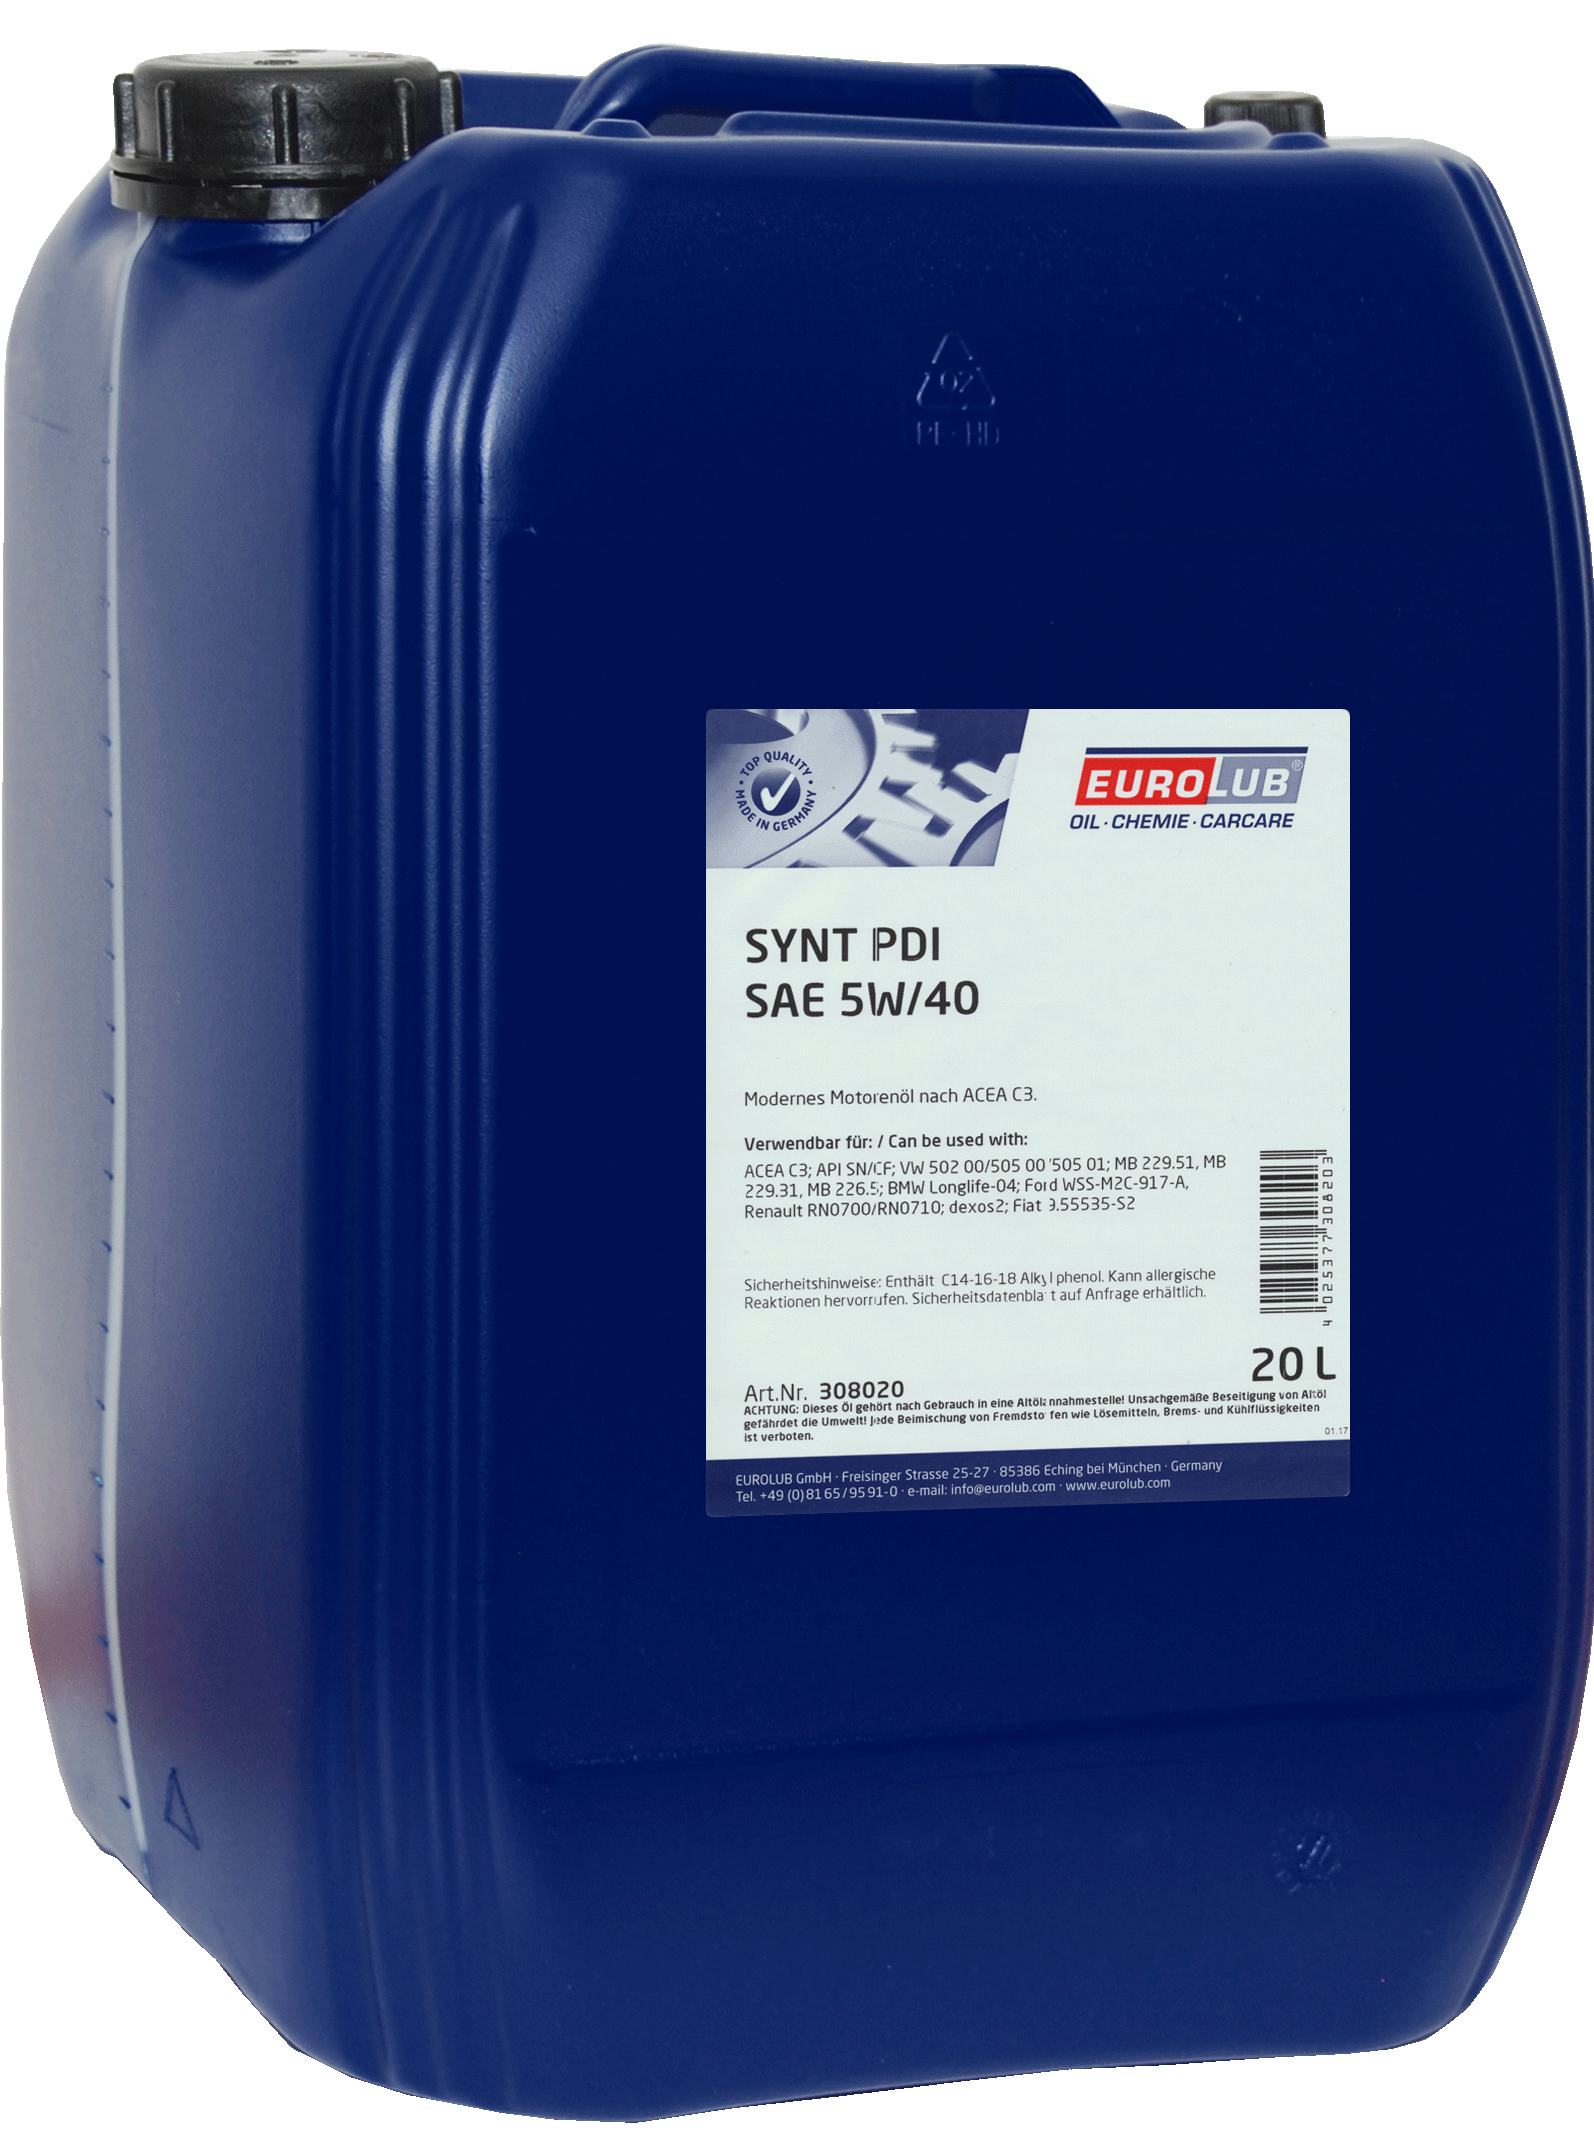 EUROLUB   SYNT PDI SAE 5W/40 (синтетическое, Mid SAPS), 20л